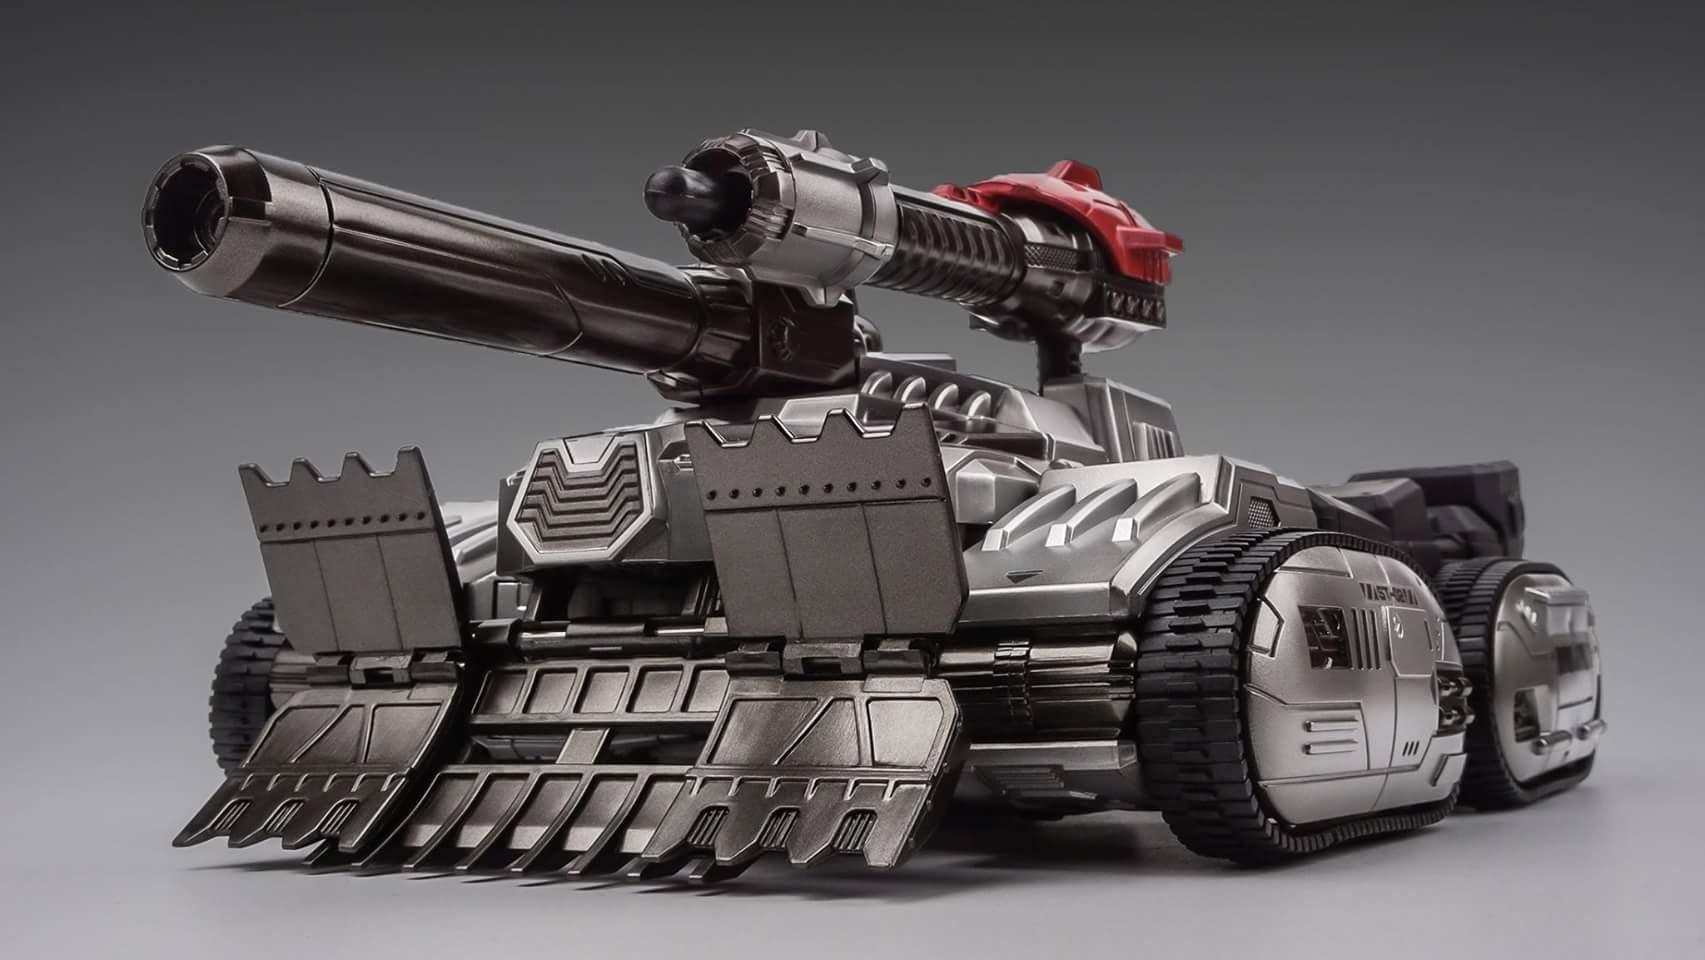 [SparkToys] Produit Tiers - ST - aka War Within: Optimus, Mégatron, Grimlock/La Menace, etc - Page 2 AxCK2pJm